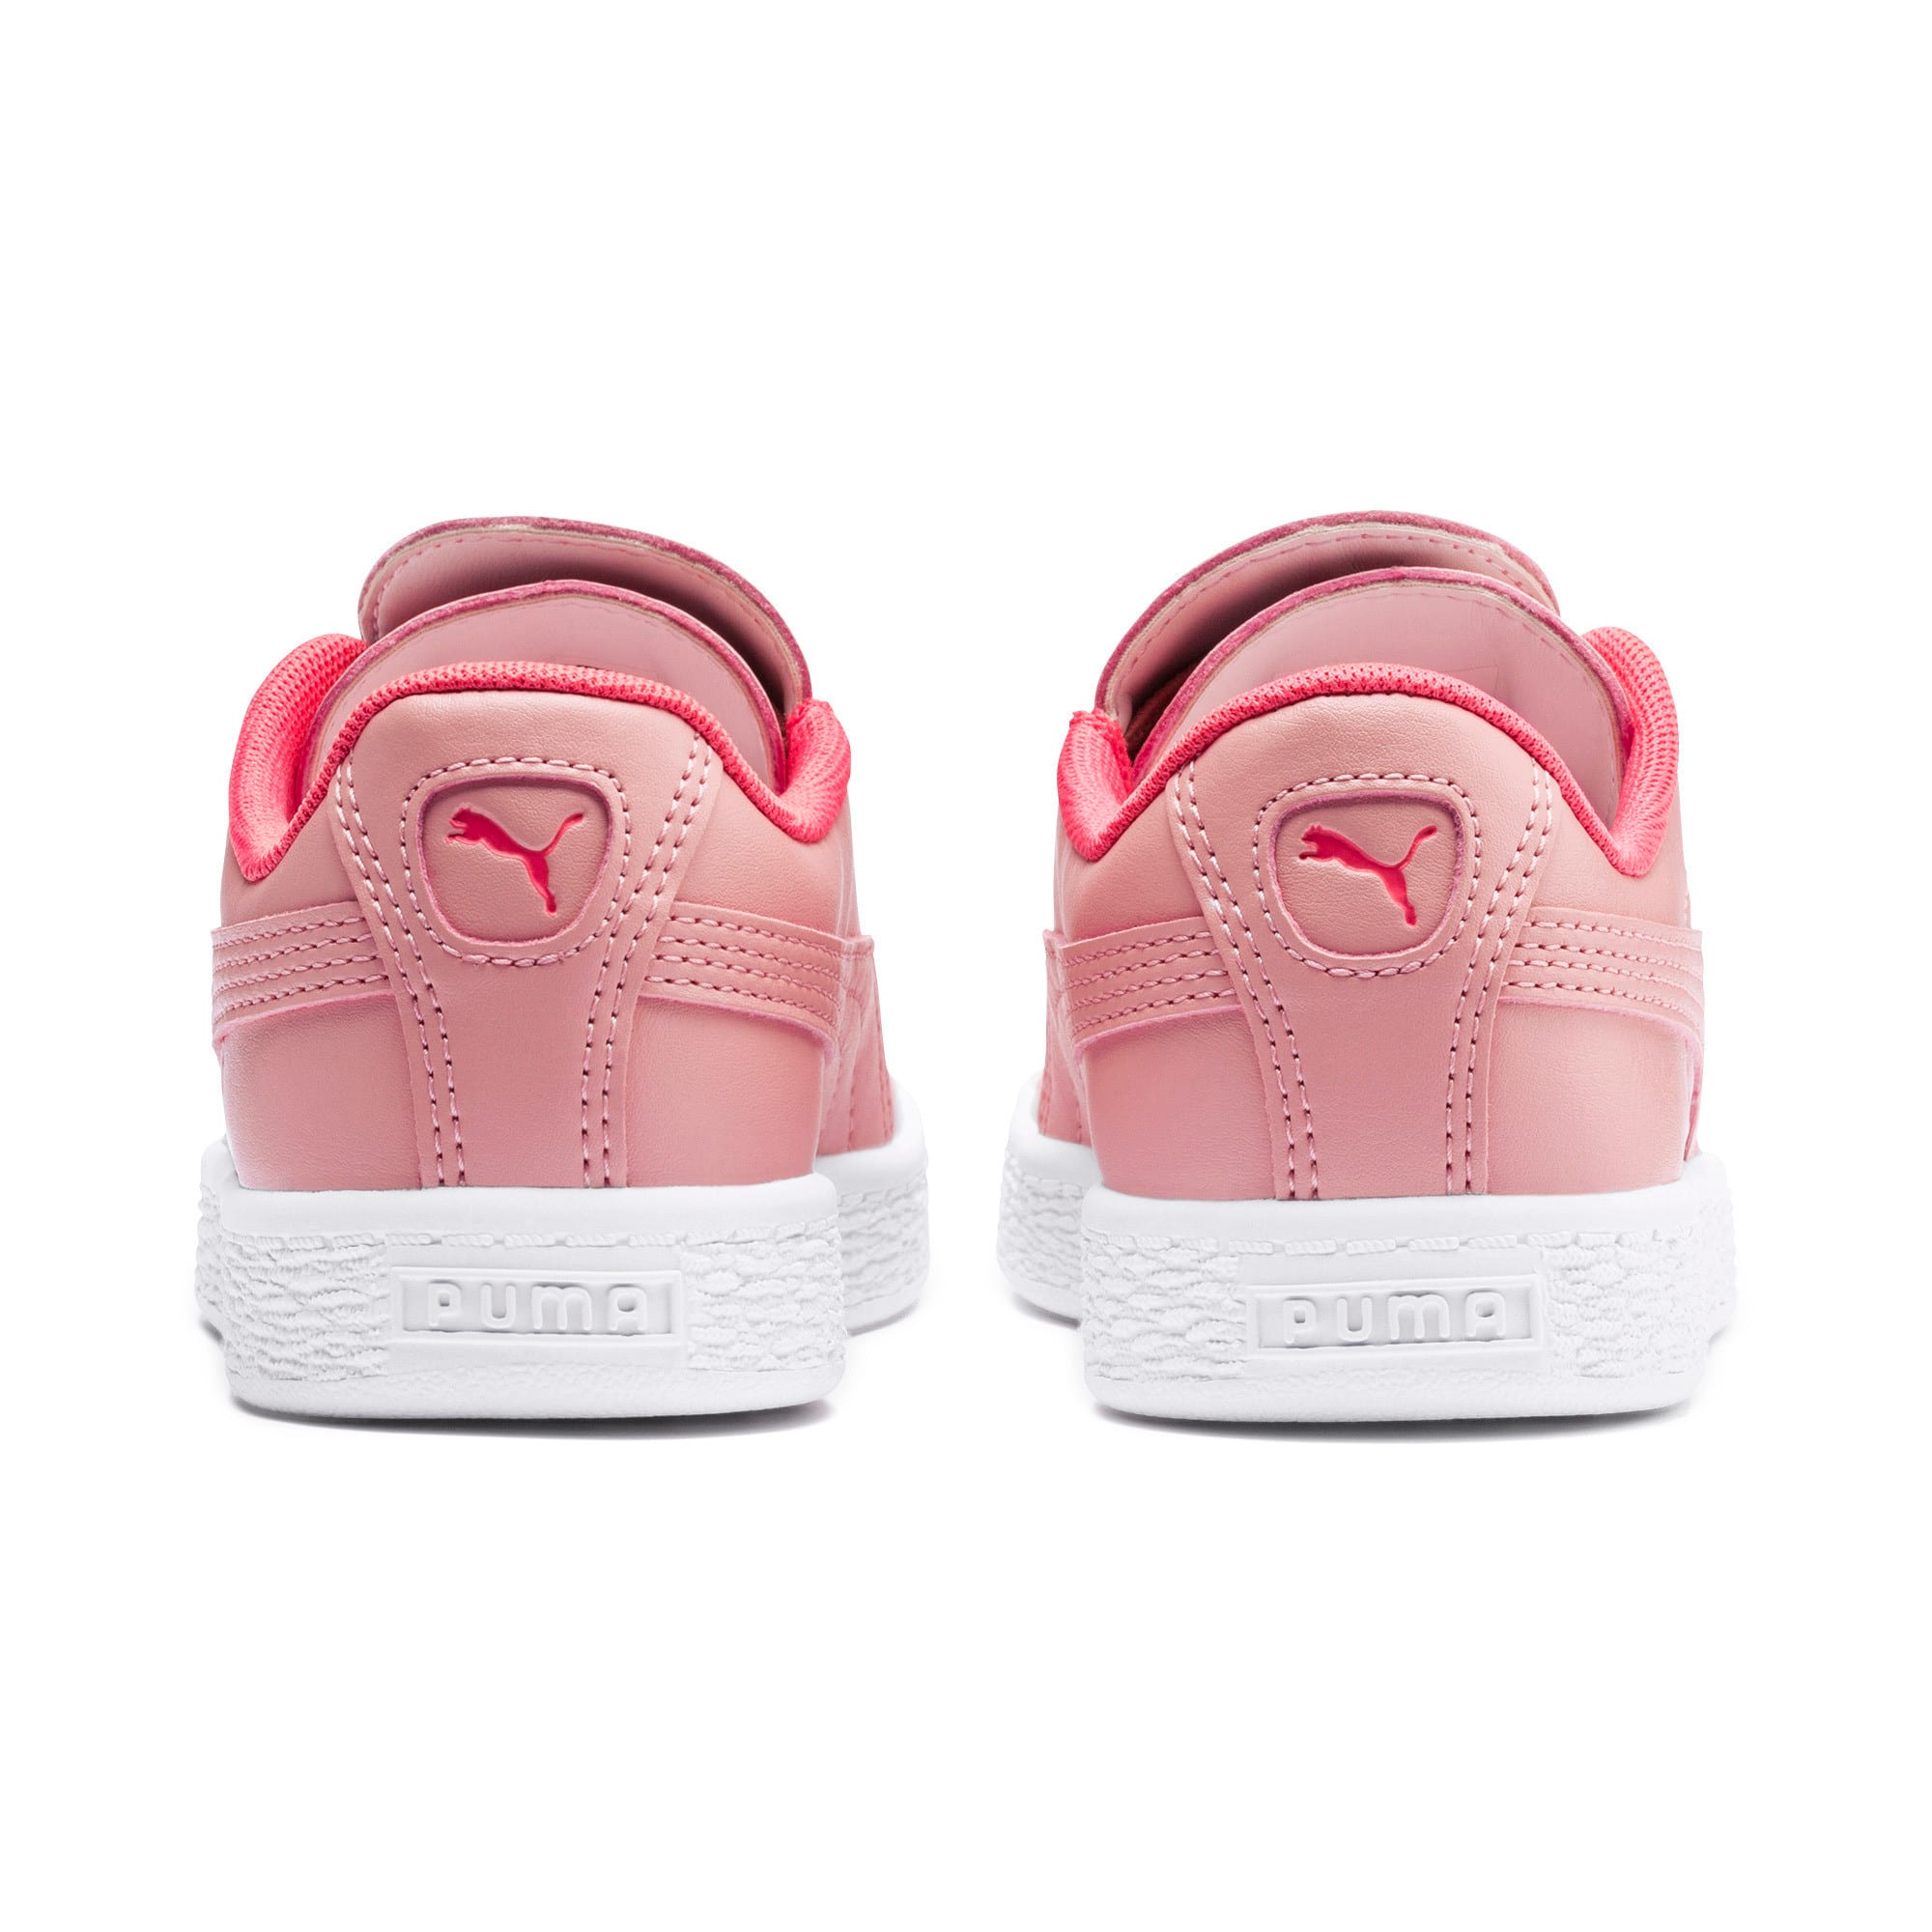 Thumbnail 3 of Basket Crush Kids' Trainers, Bridal Rose-Pink Alert, medium-IND